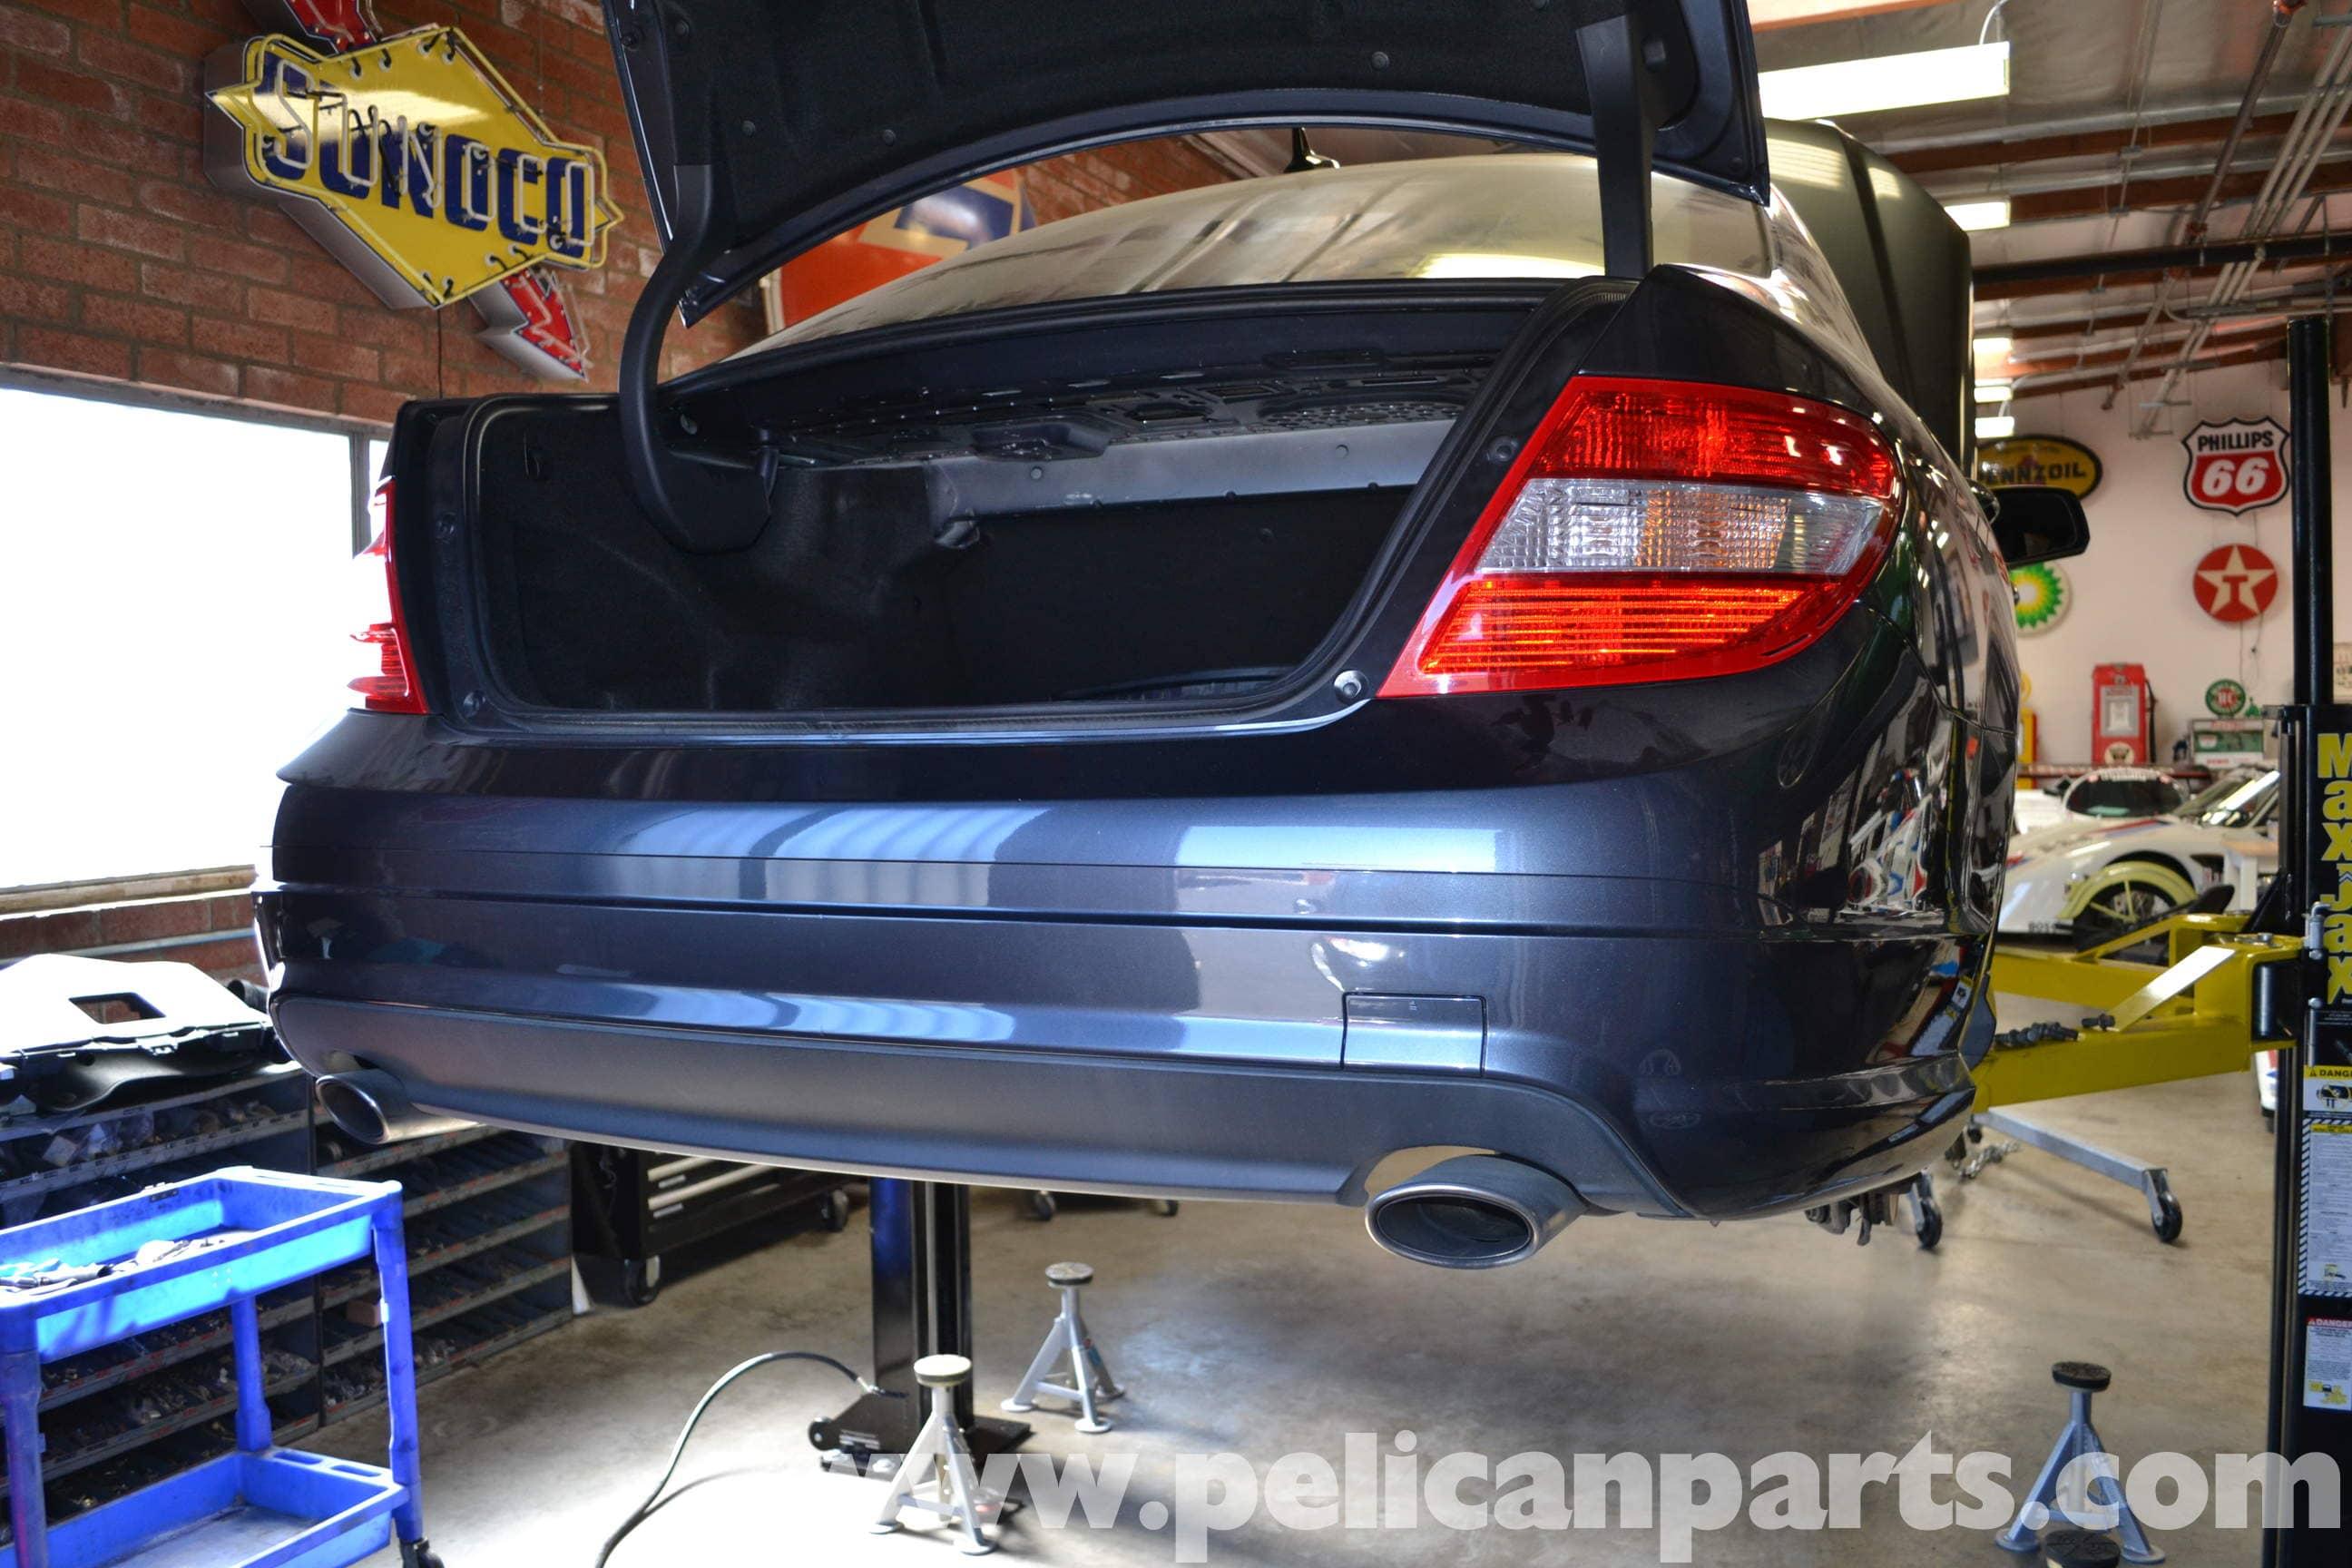 Mercedes-Benz W204 Rear Bumper Cover Removal - (2008-2014) C250